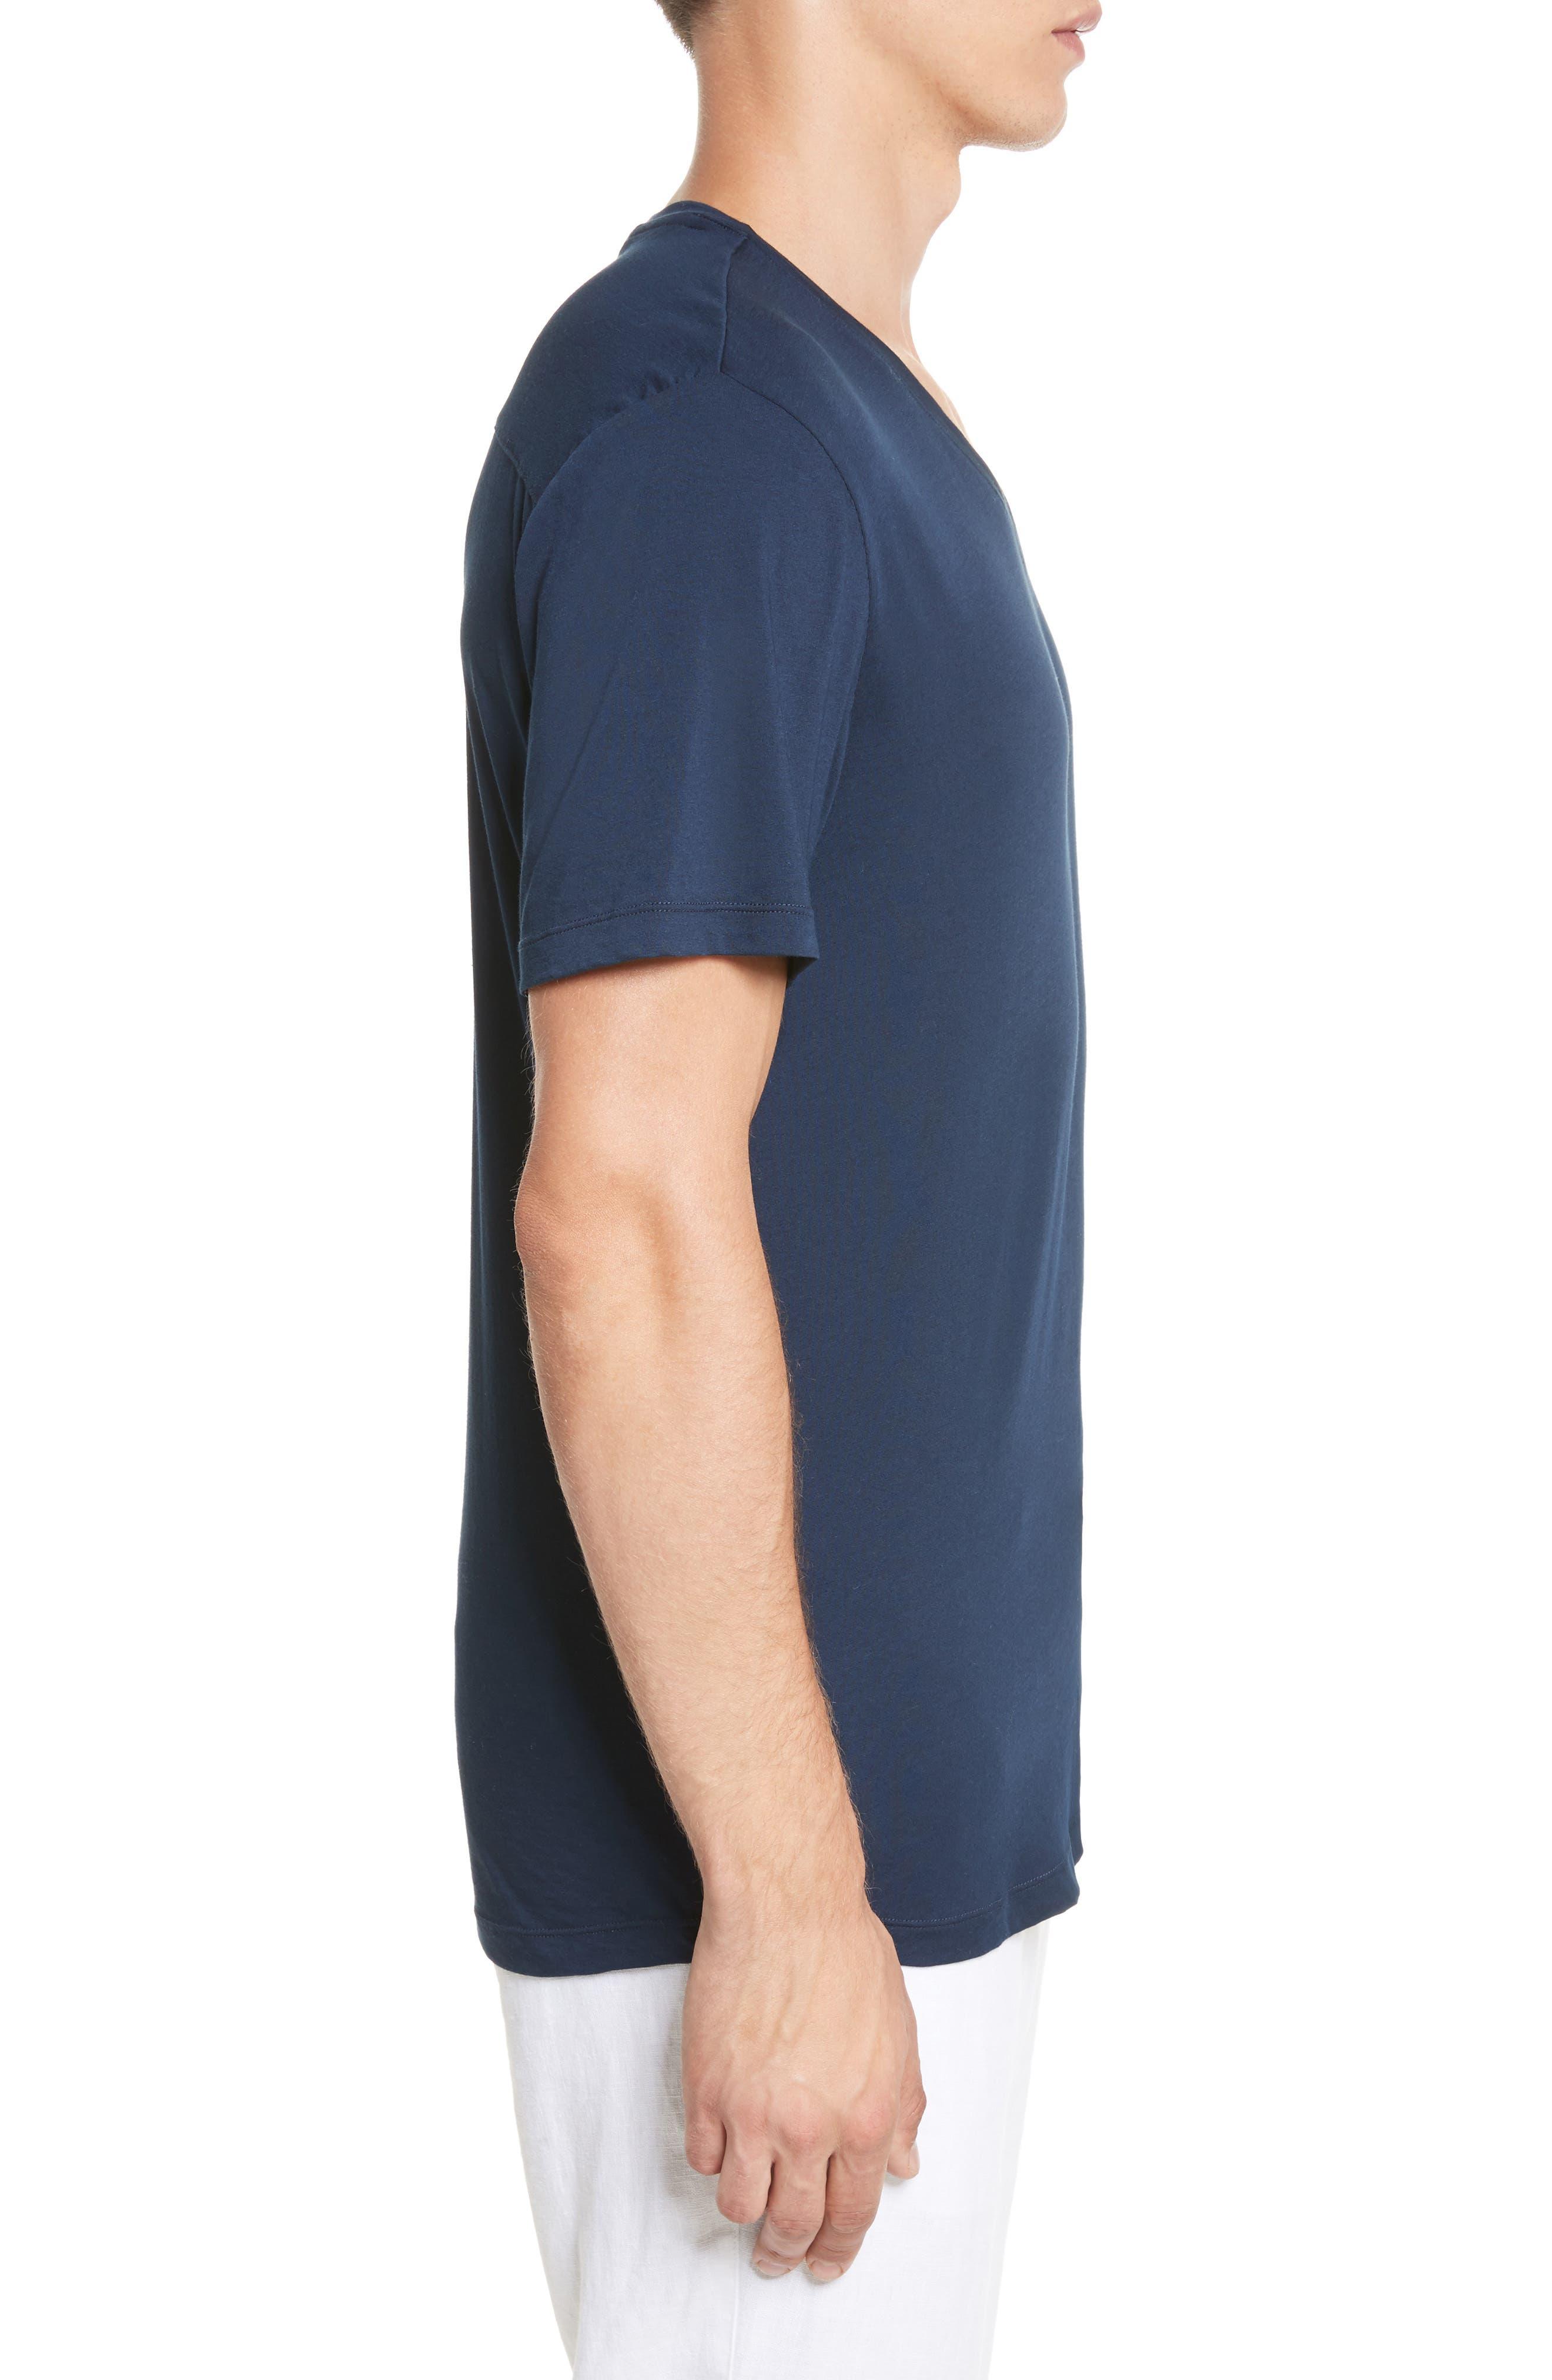 Joey V-Neck T-shirt,                             Alternate thumbnail 3, color,                             419